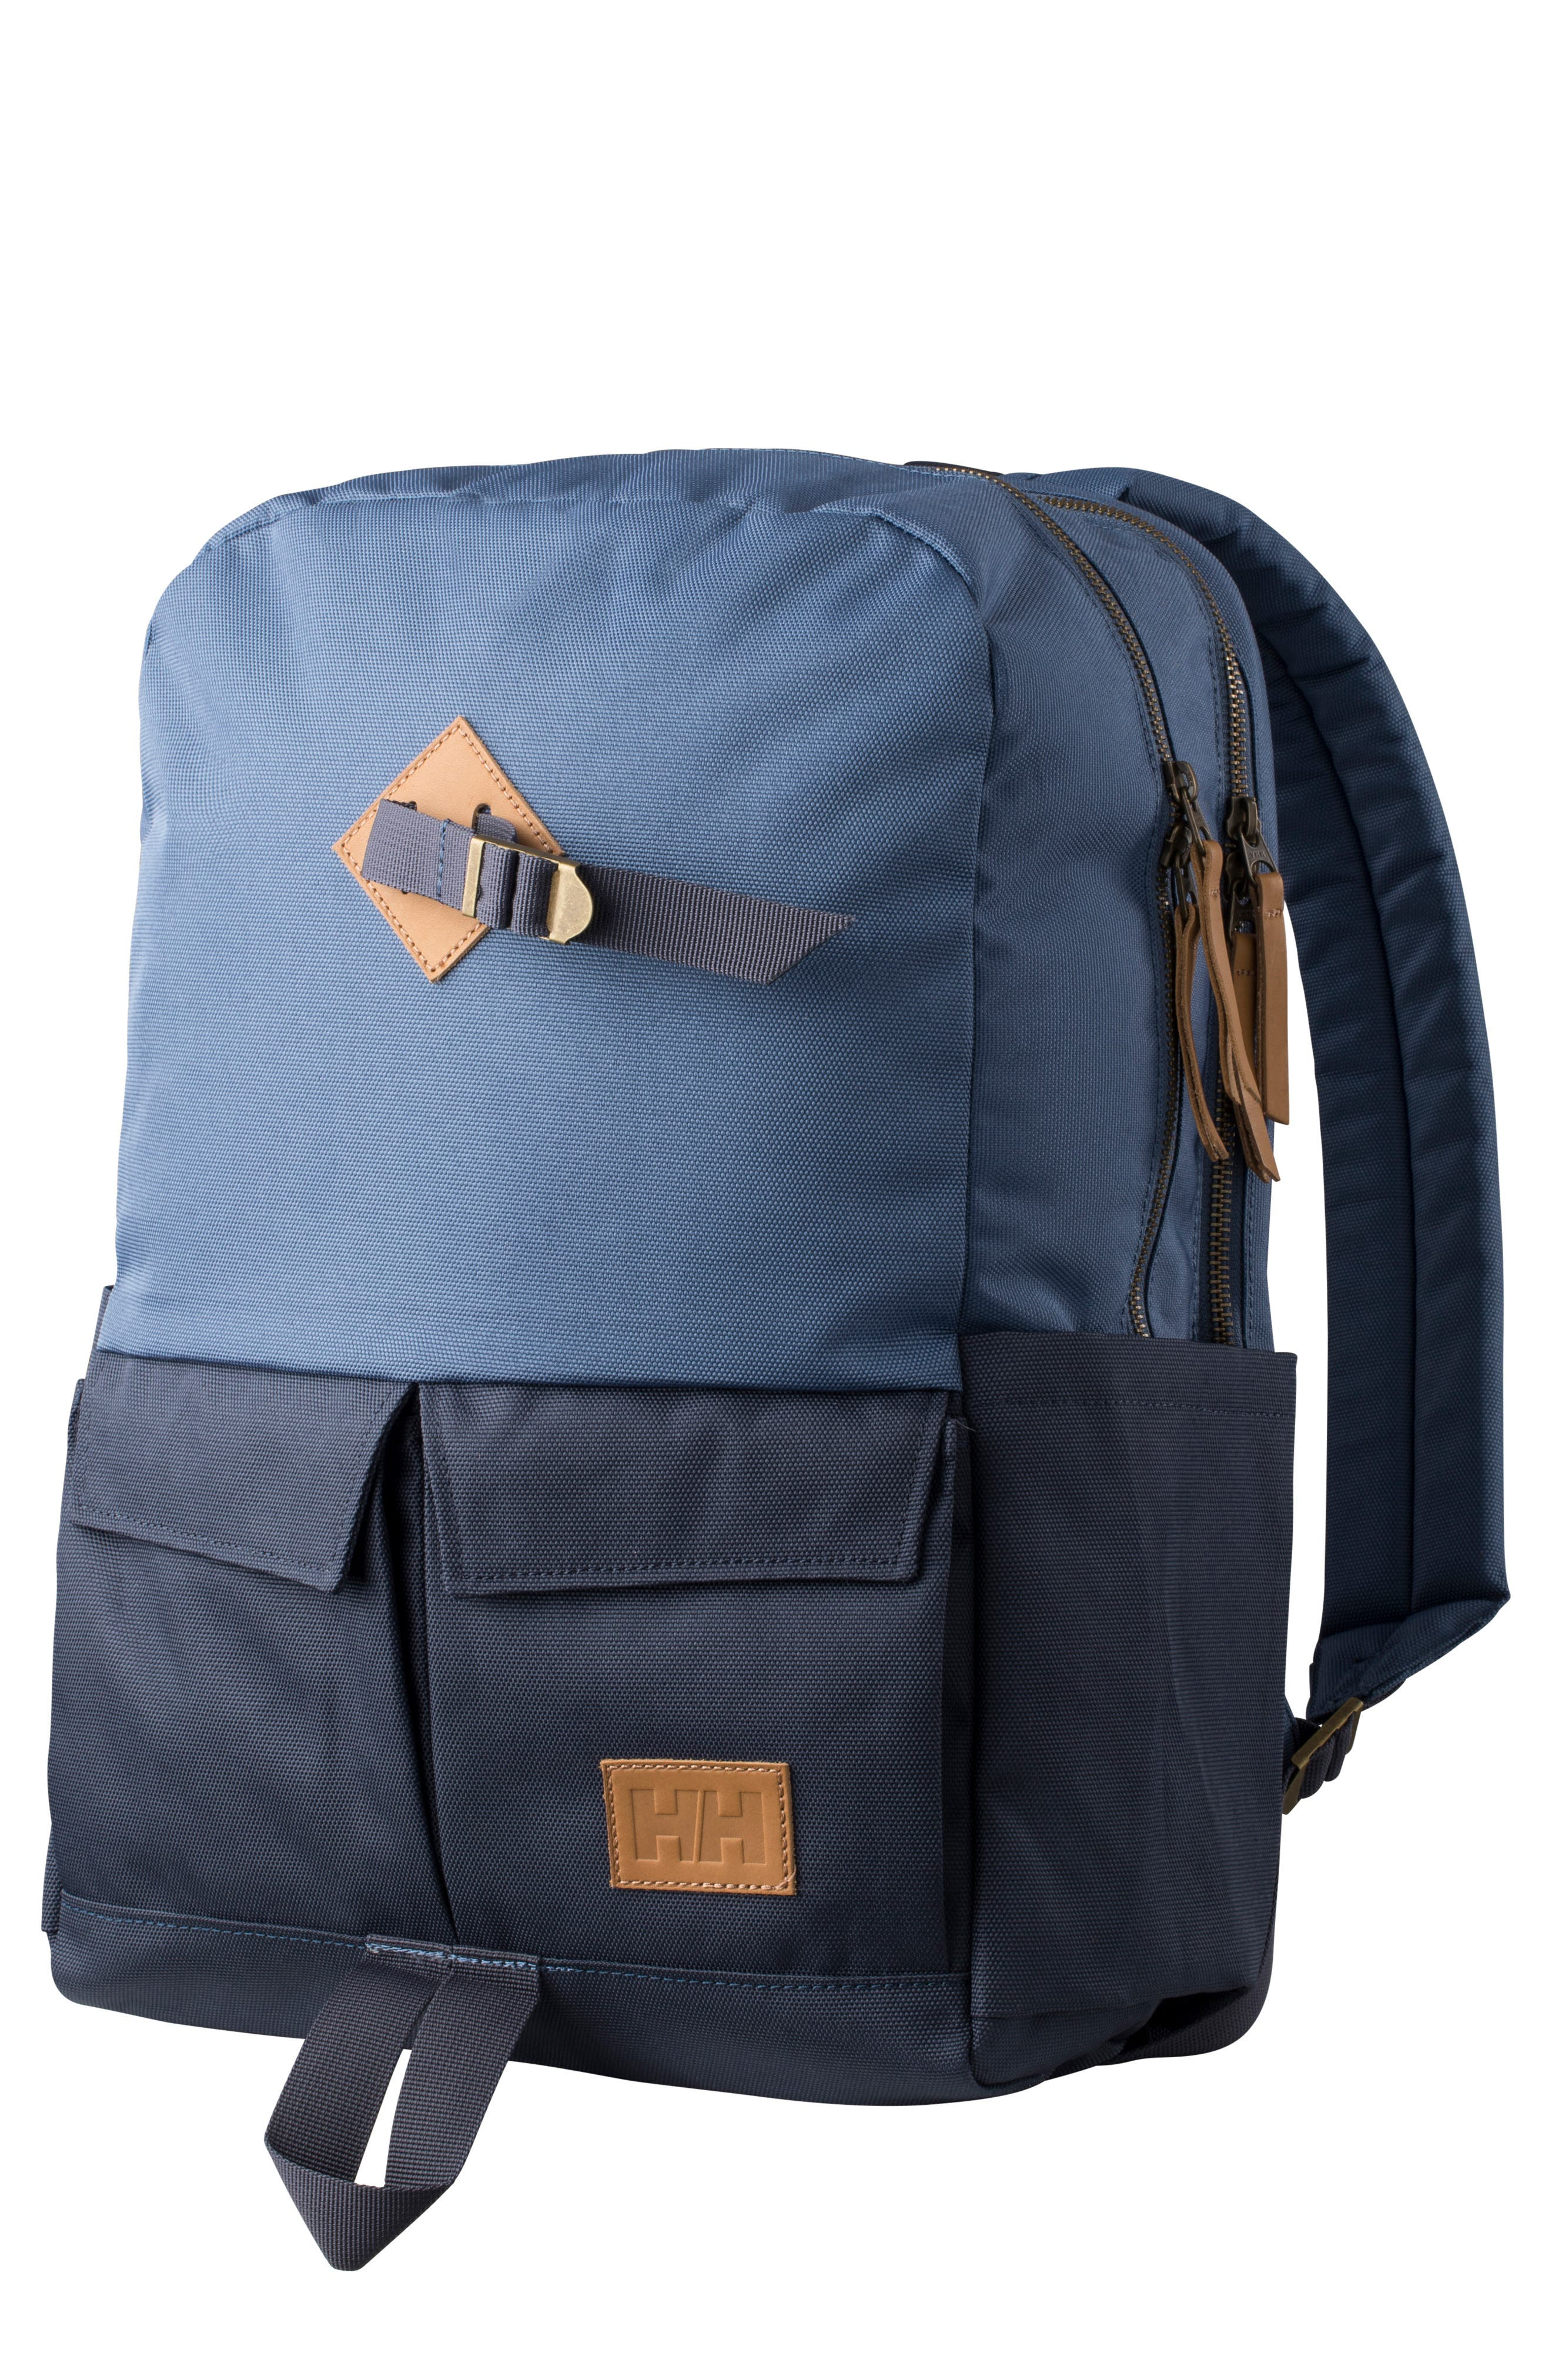 Bergen Backpack,                             Main thumbnail 1, color,                             GRAPHITE BLUE